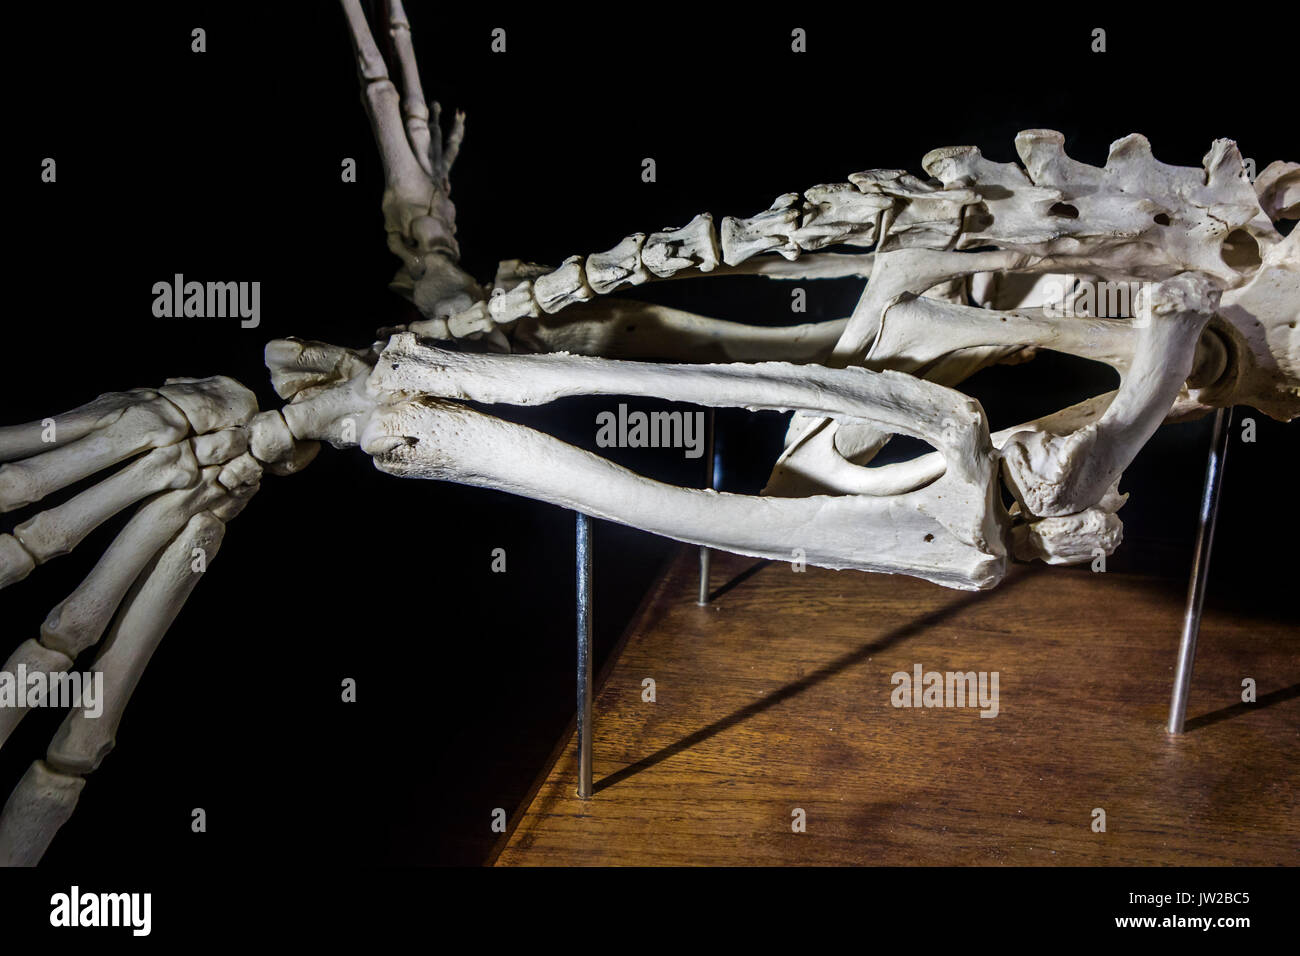 Detail of common seal / harbor seal /  harbour seal (Phoca vitulina) skeleton showing phalanges, tibia, femur and fibula bones in hind limb - Stock Image